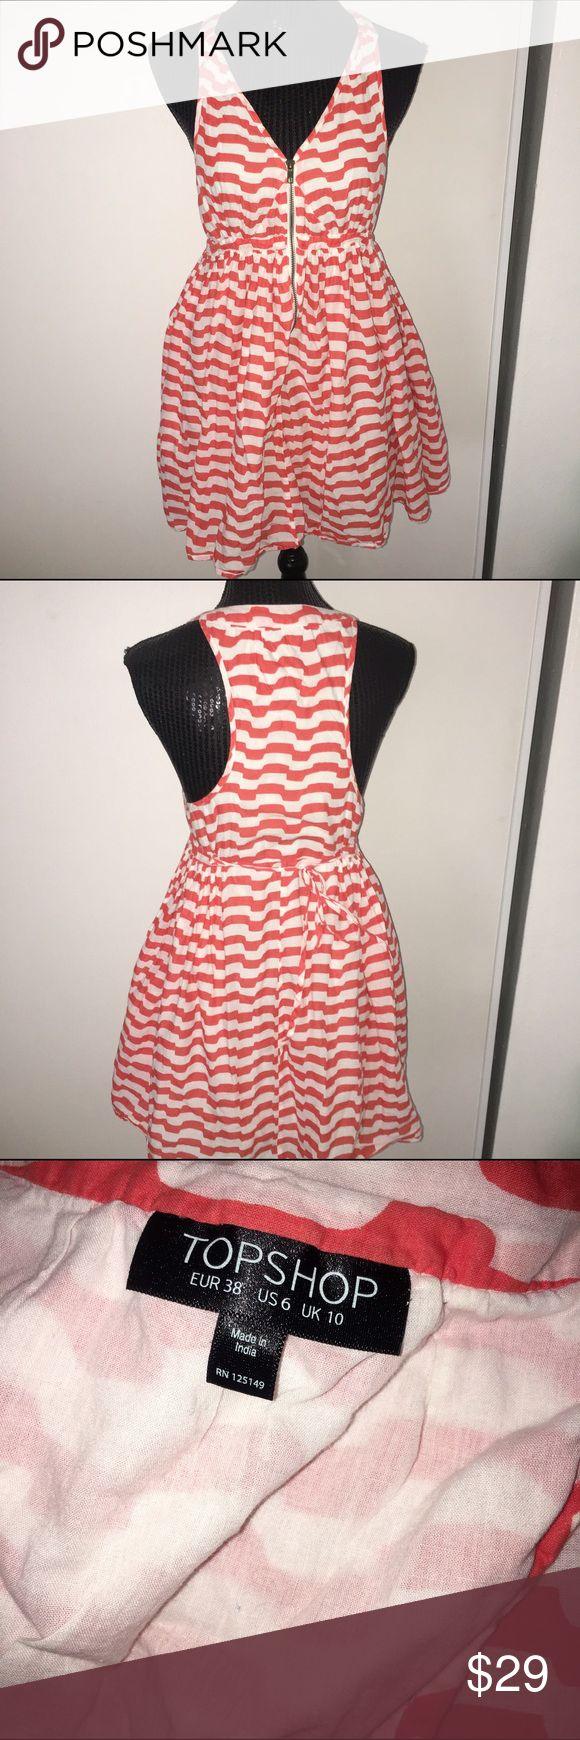 Orange chevron size 6 TOPSHOP dress So cute Topshop Dresses Mini